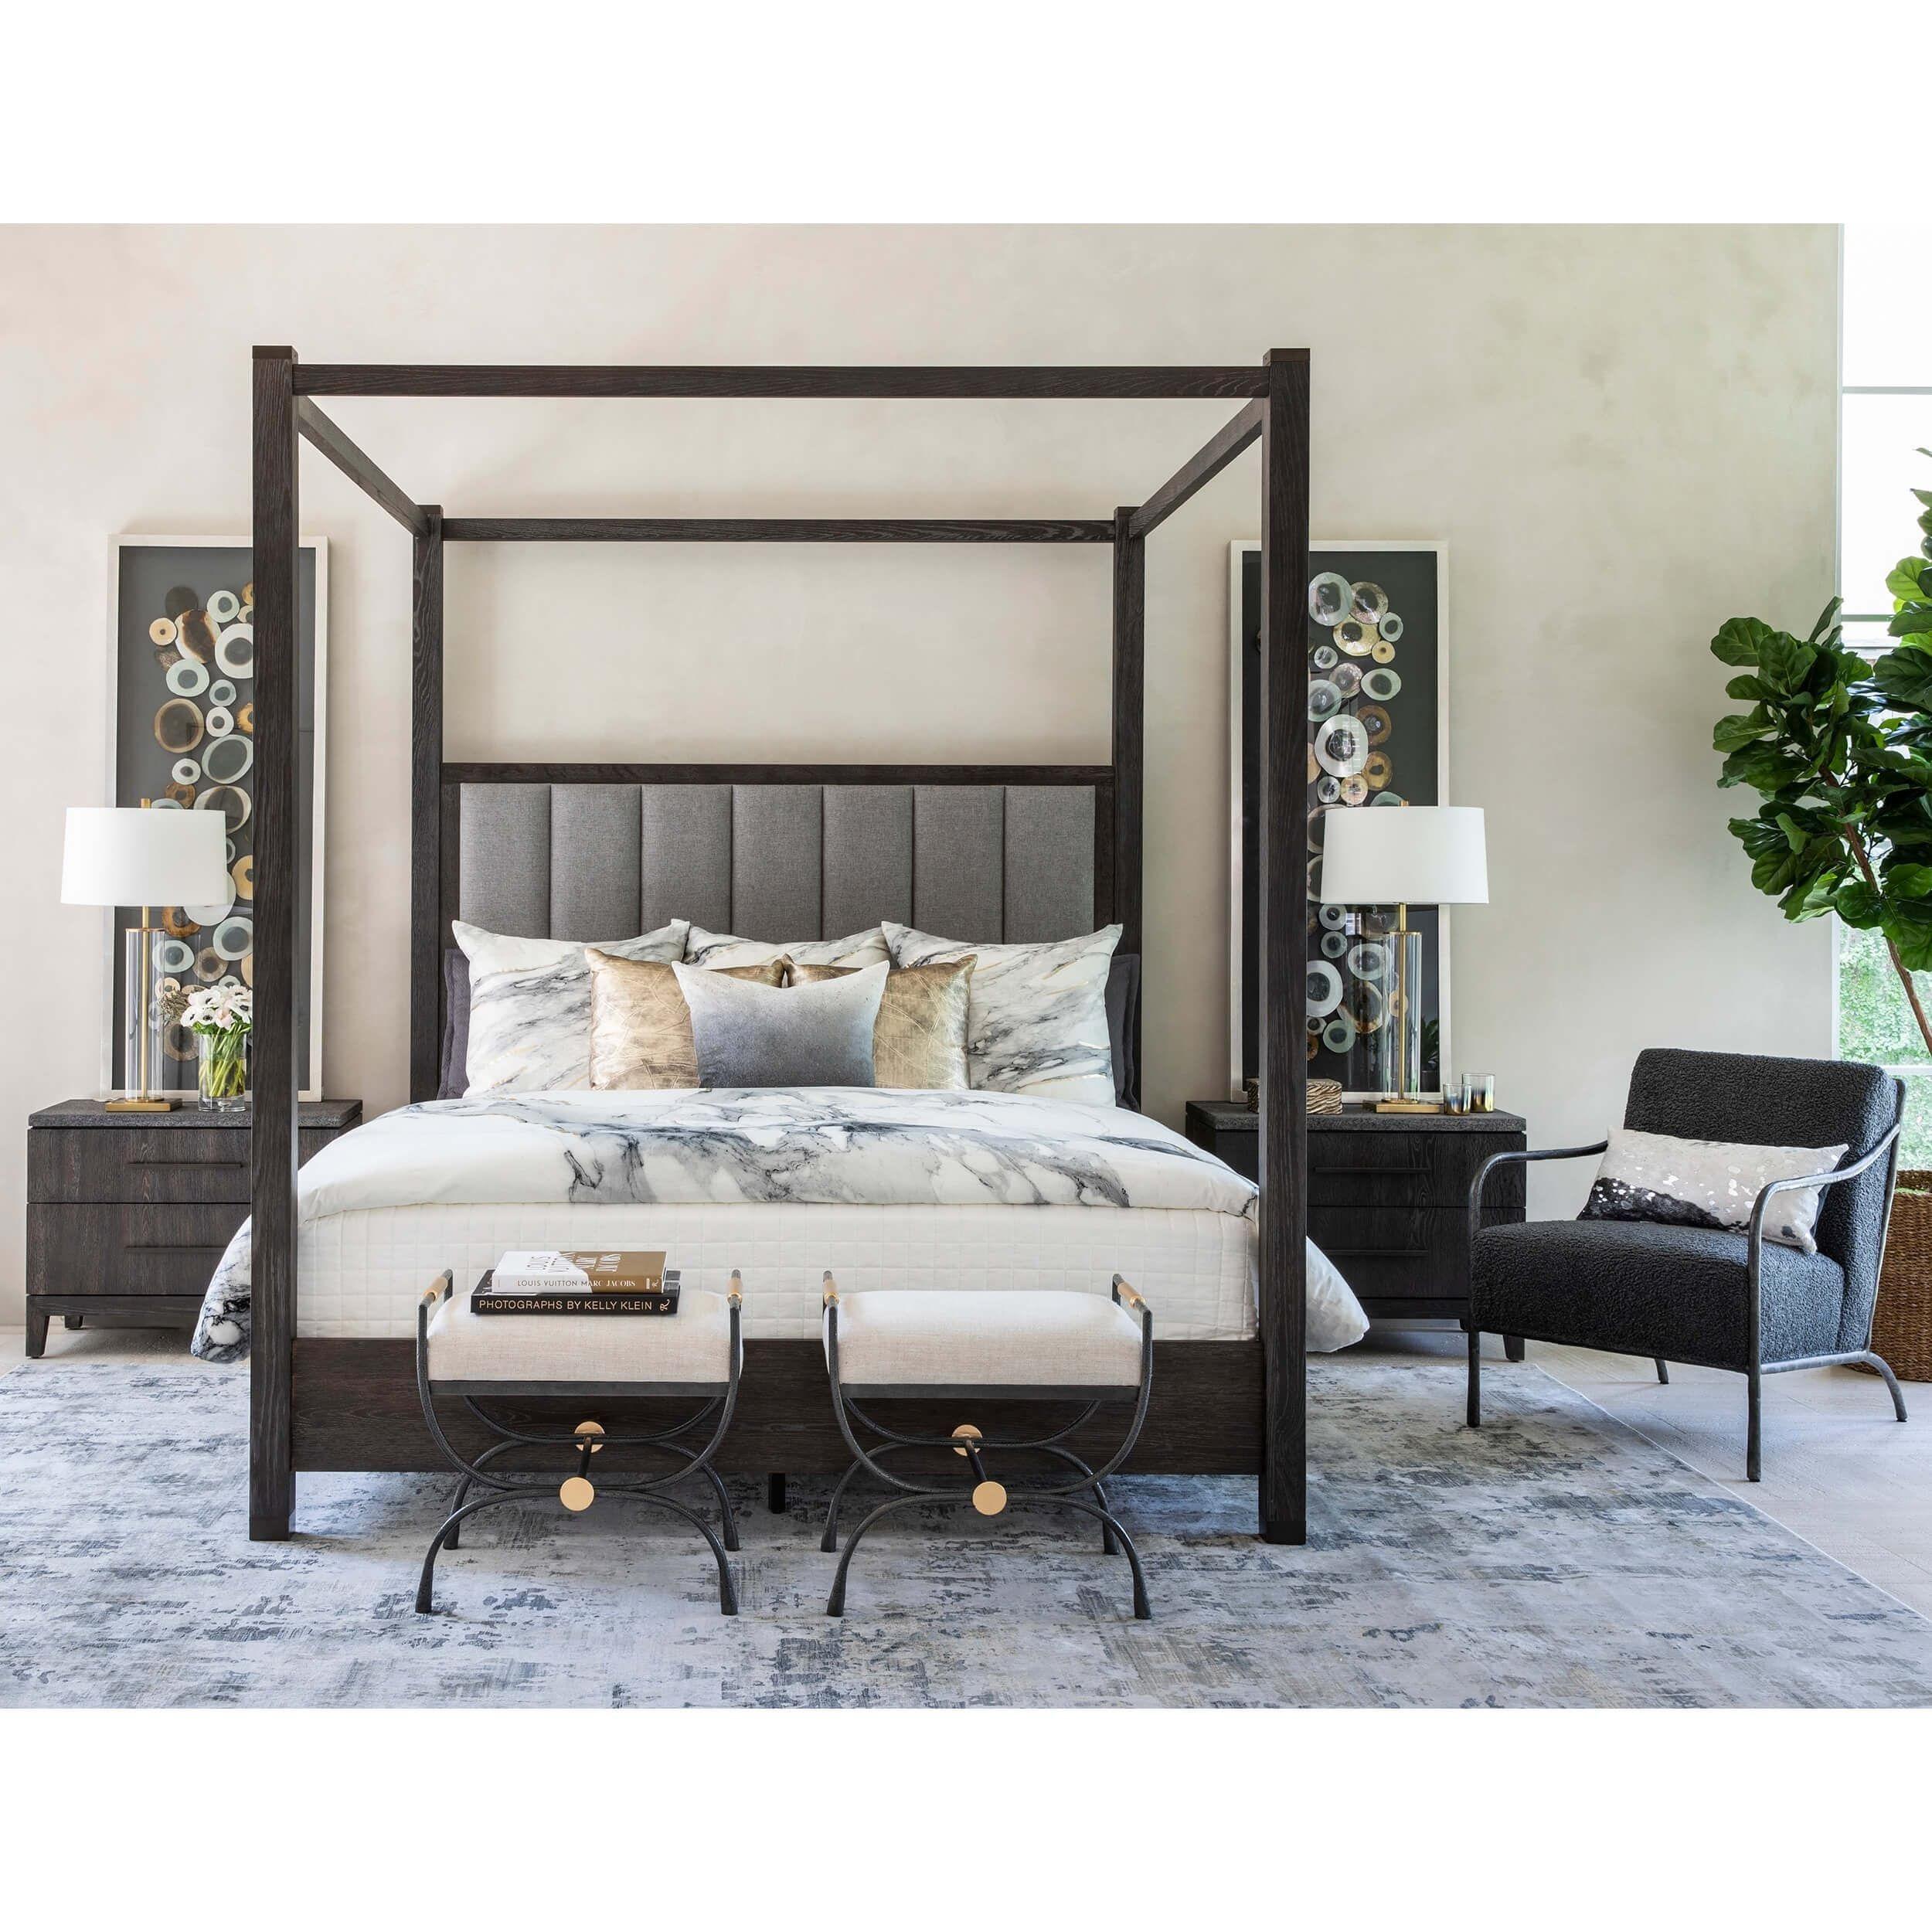 Miramar Aventura San Marcos Nightstand Cheap Bedroom Furniture Elegant Home Decor Home Decor Bedroom